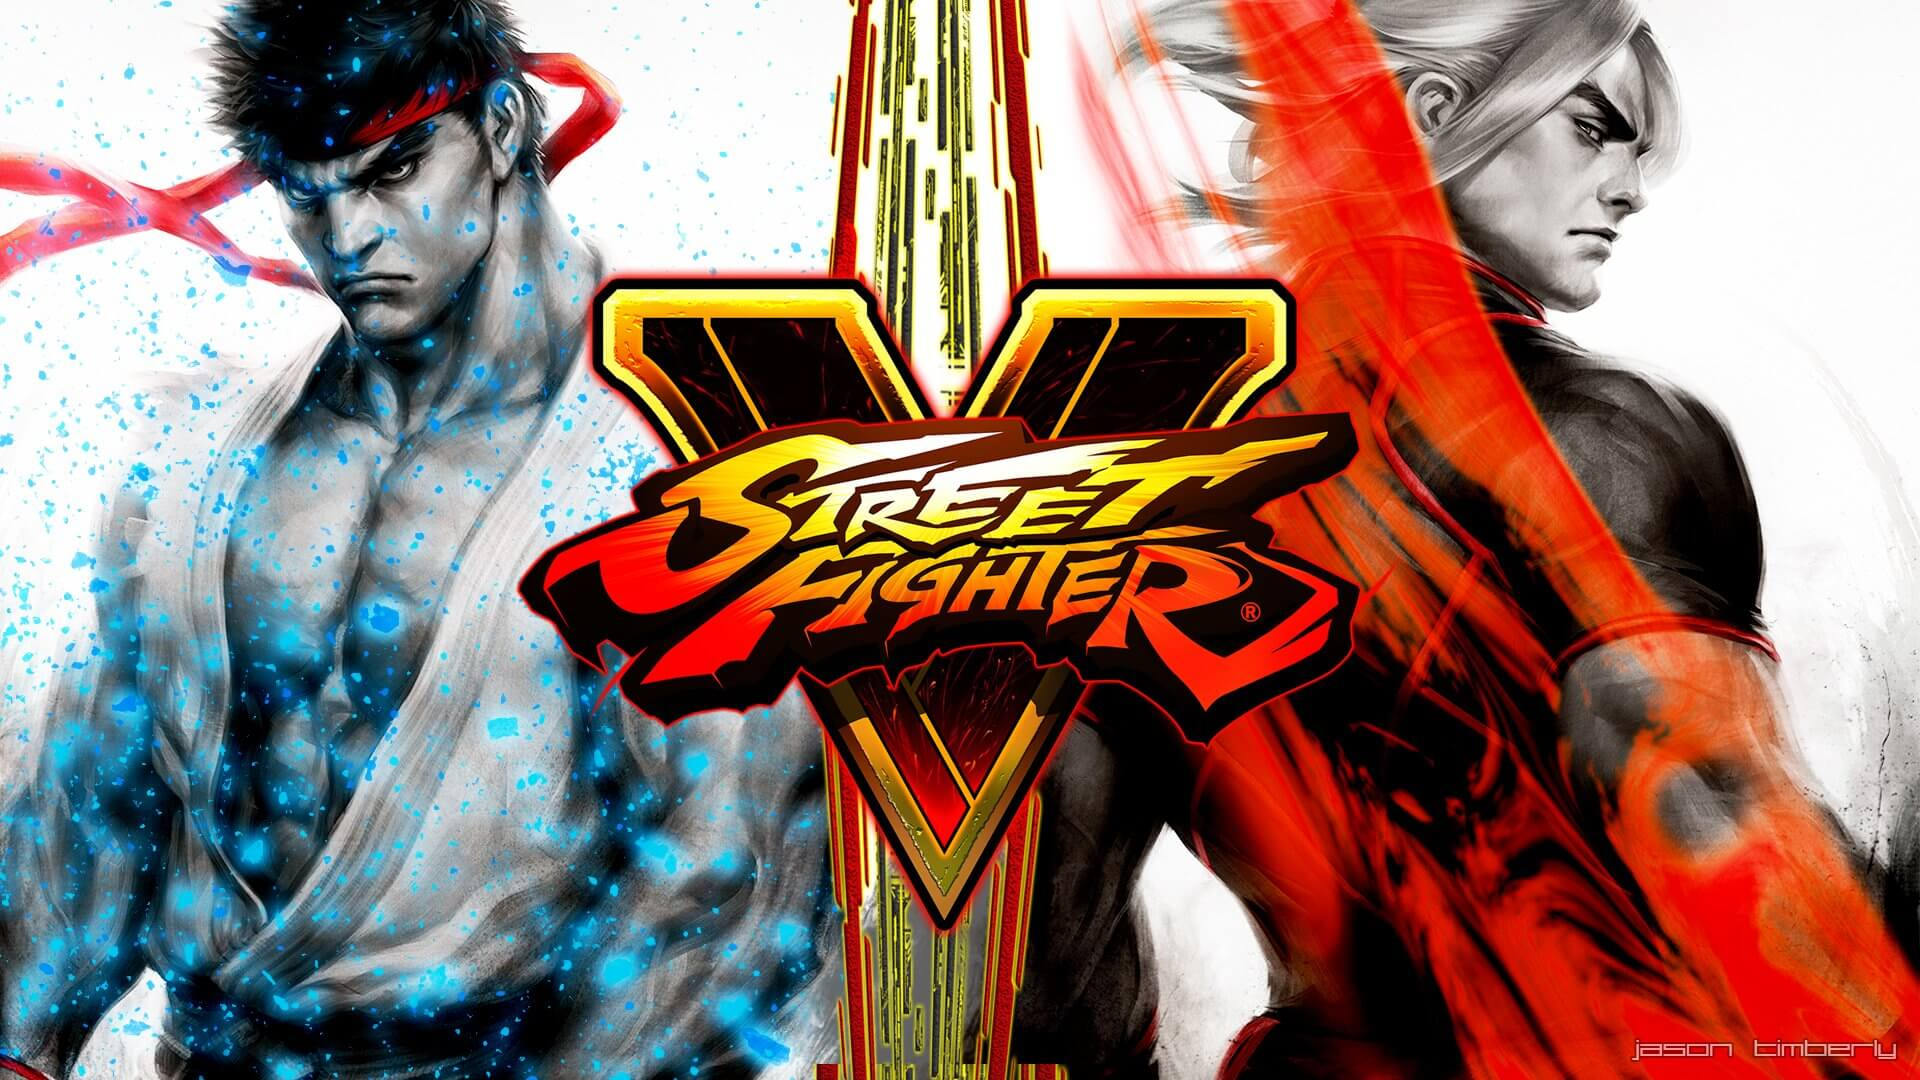 Street Fighter V Summer Update. Watch now!